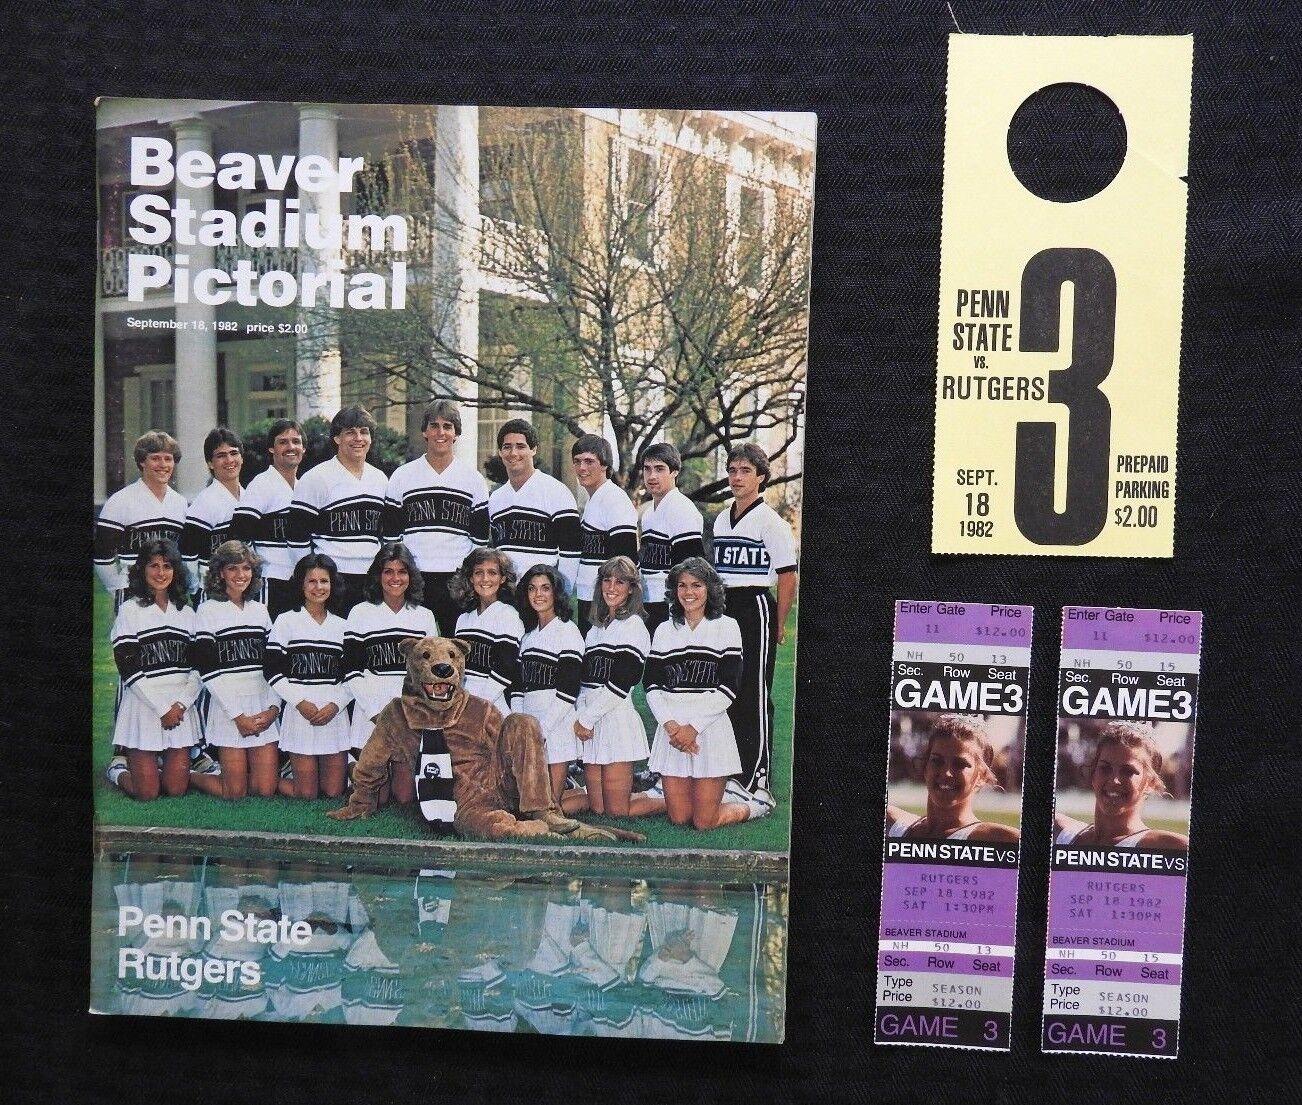 Septiembre 8 1982 Penn Estado Leones vs Rutgers Fútbol Programa + 2 Completo